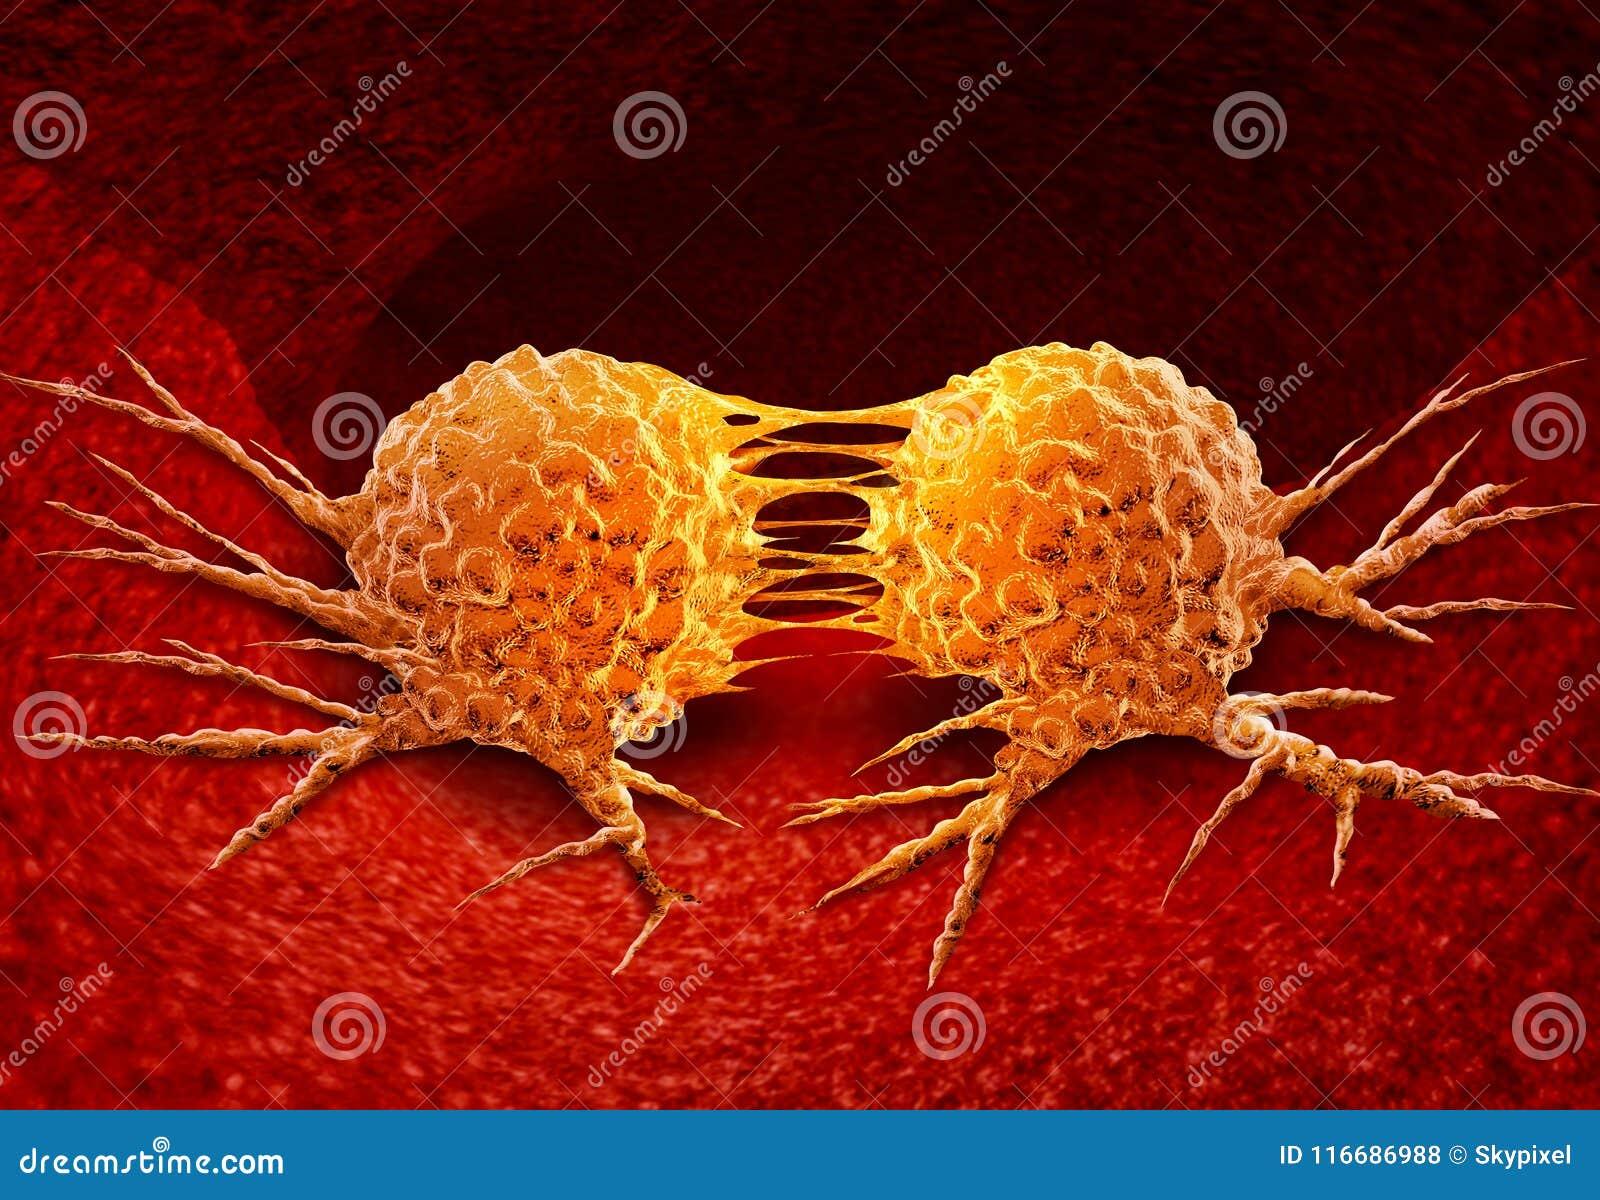 Dividing Cancer Cell stock illustration. Illustration of anatomy ...